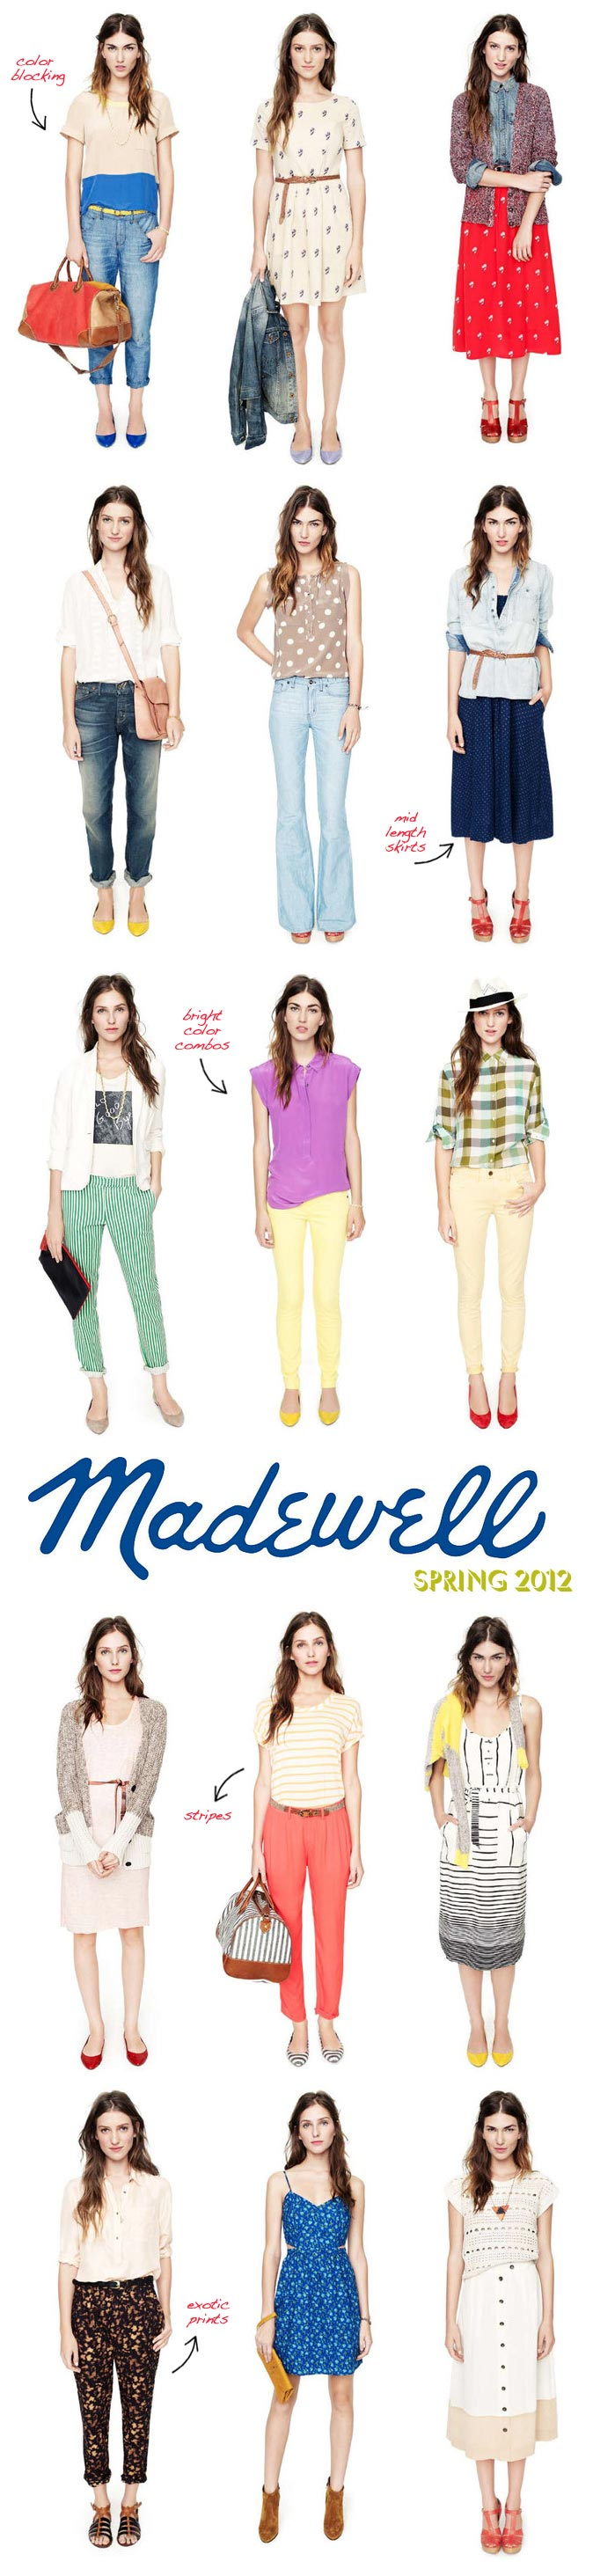 madewell2012